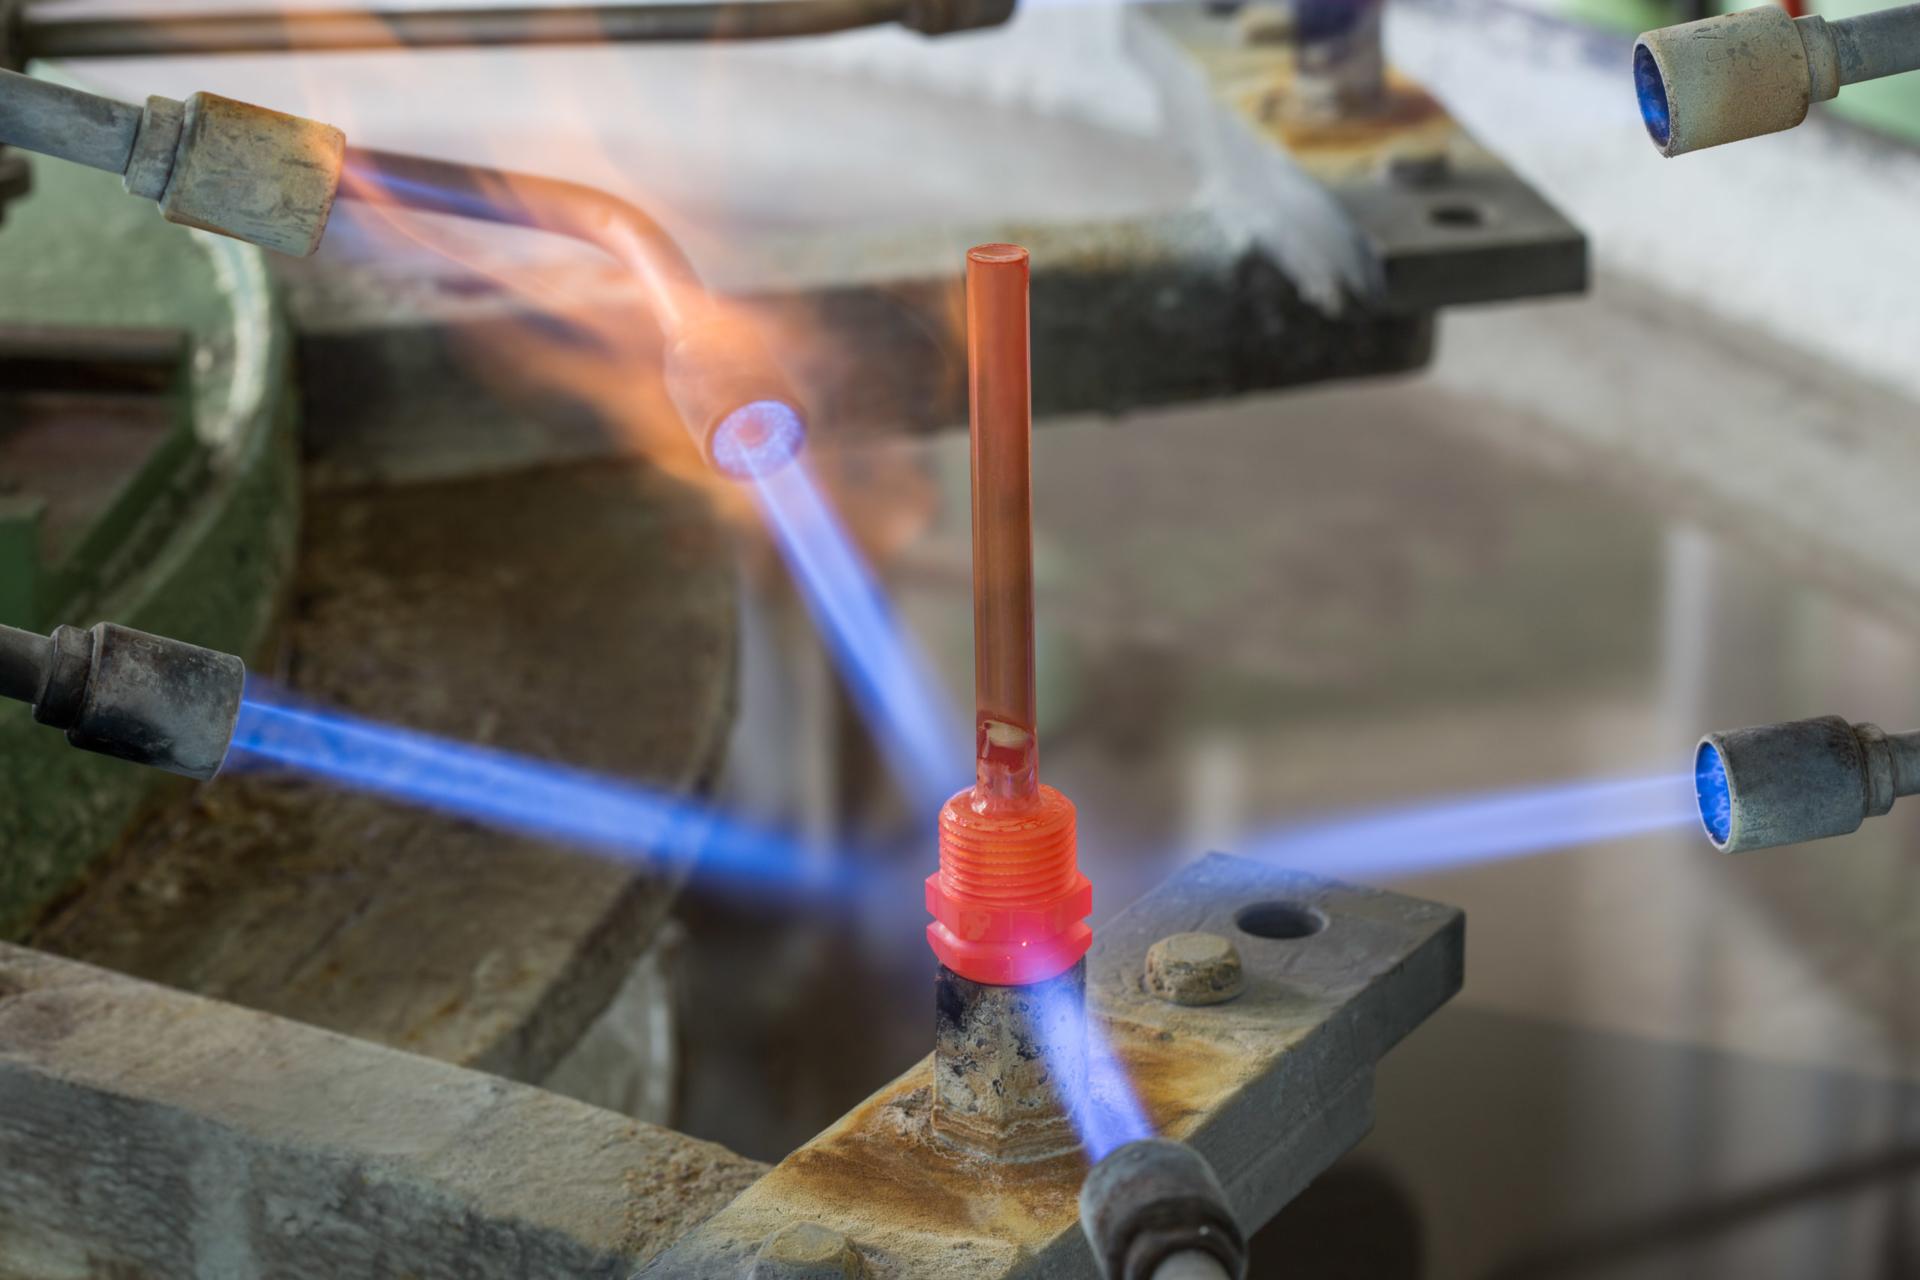 Metallverarbeitung Ziegler | Werbung Werbefotografie Werbefoto